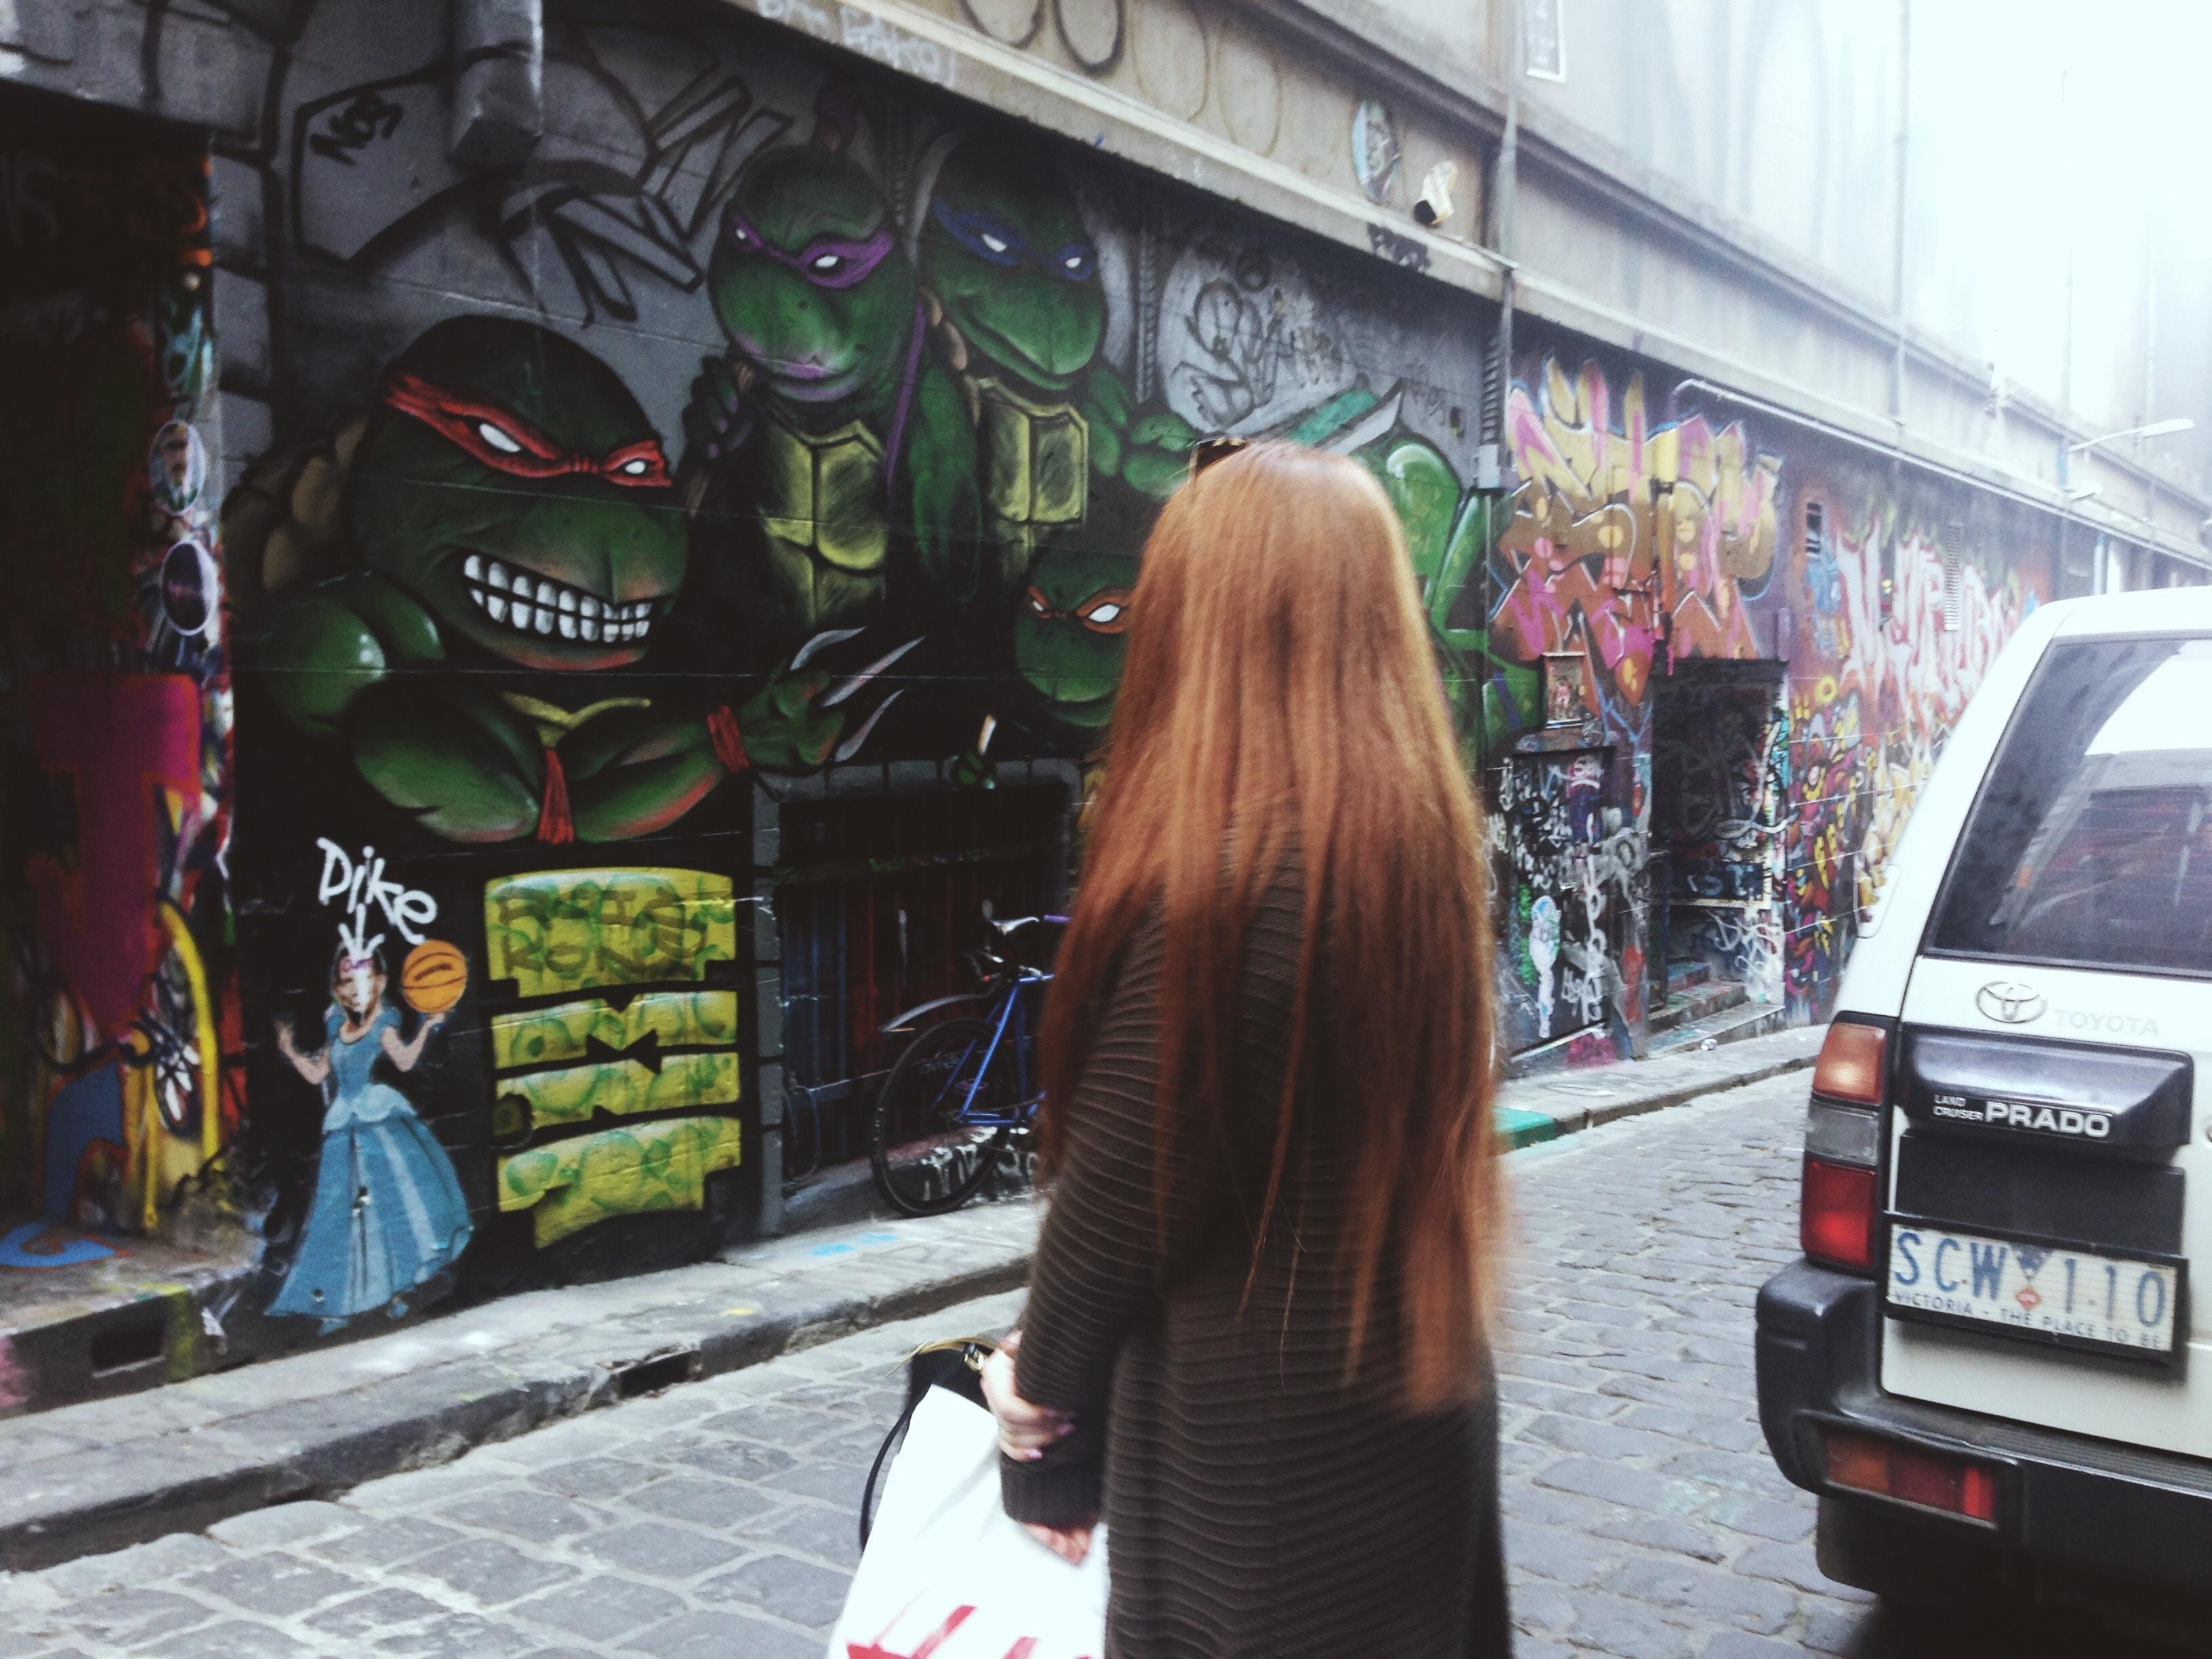 Free Unsplash photo from Chiara Pinna